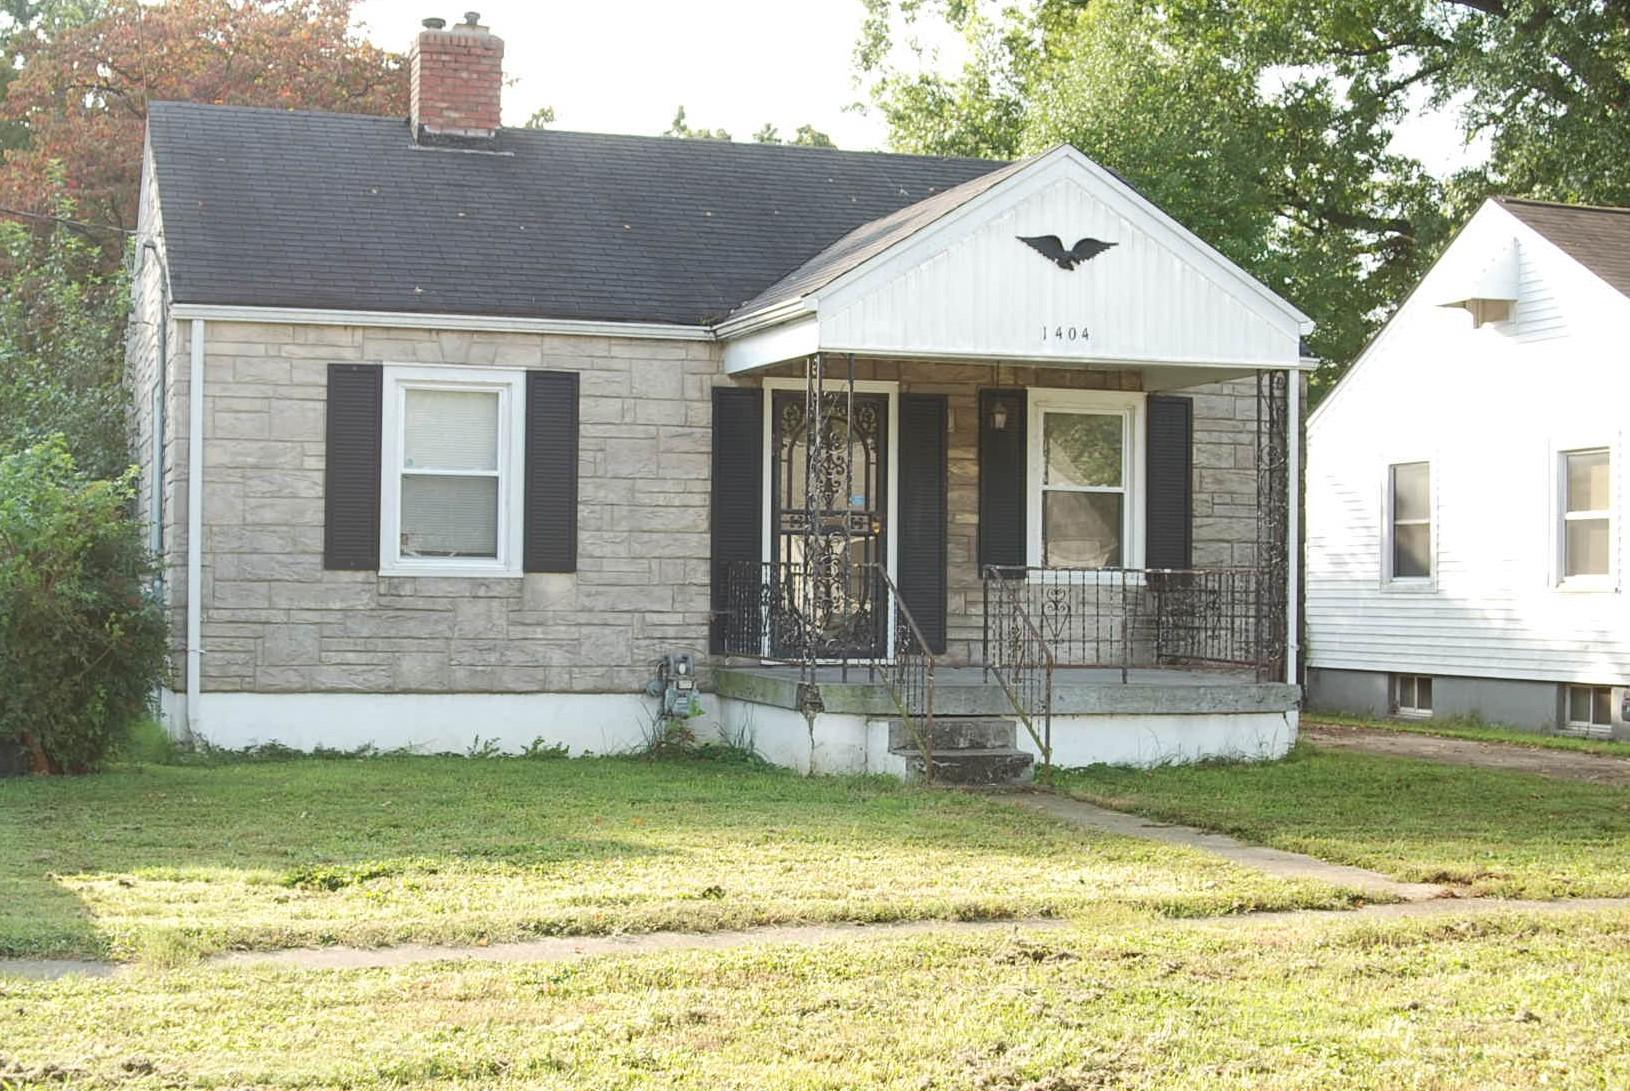 1404 Weyler Ave, Louisville, KY